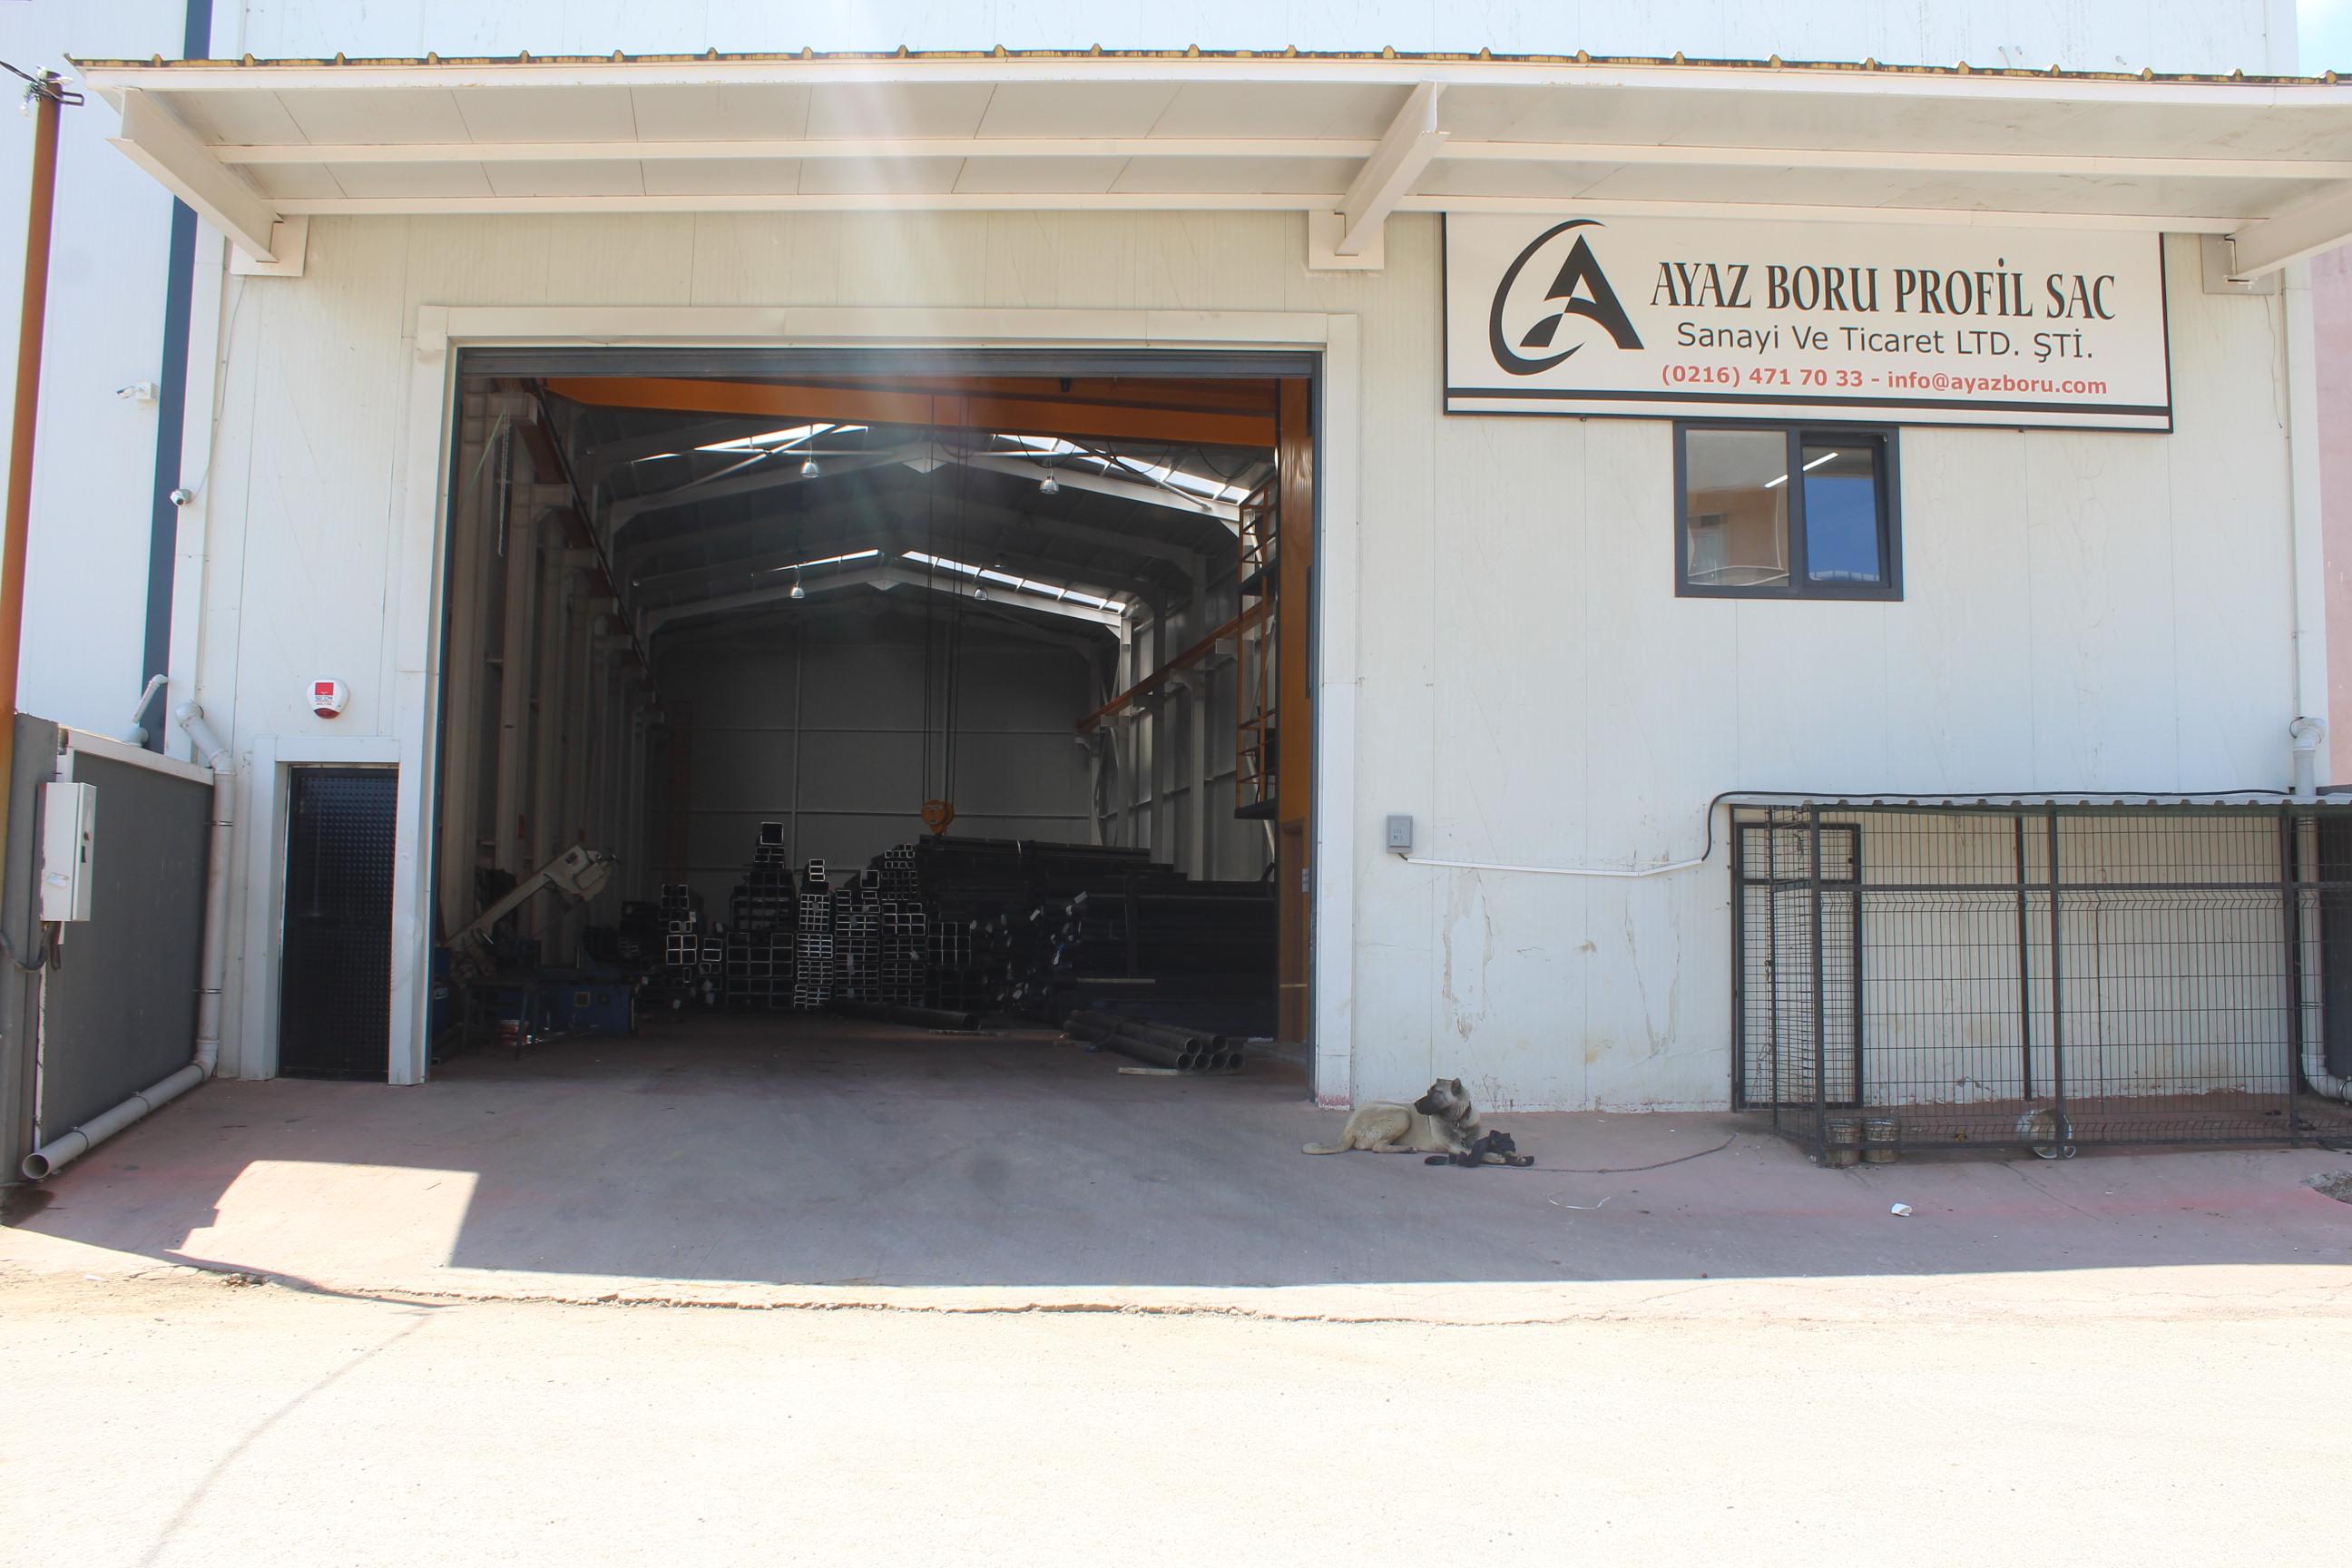 Ayaz Boru Profil Sac San Tic Ltd Şti